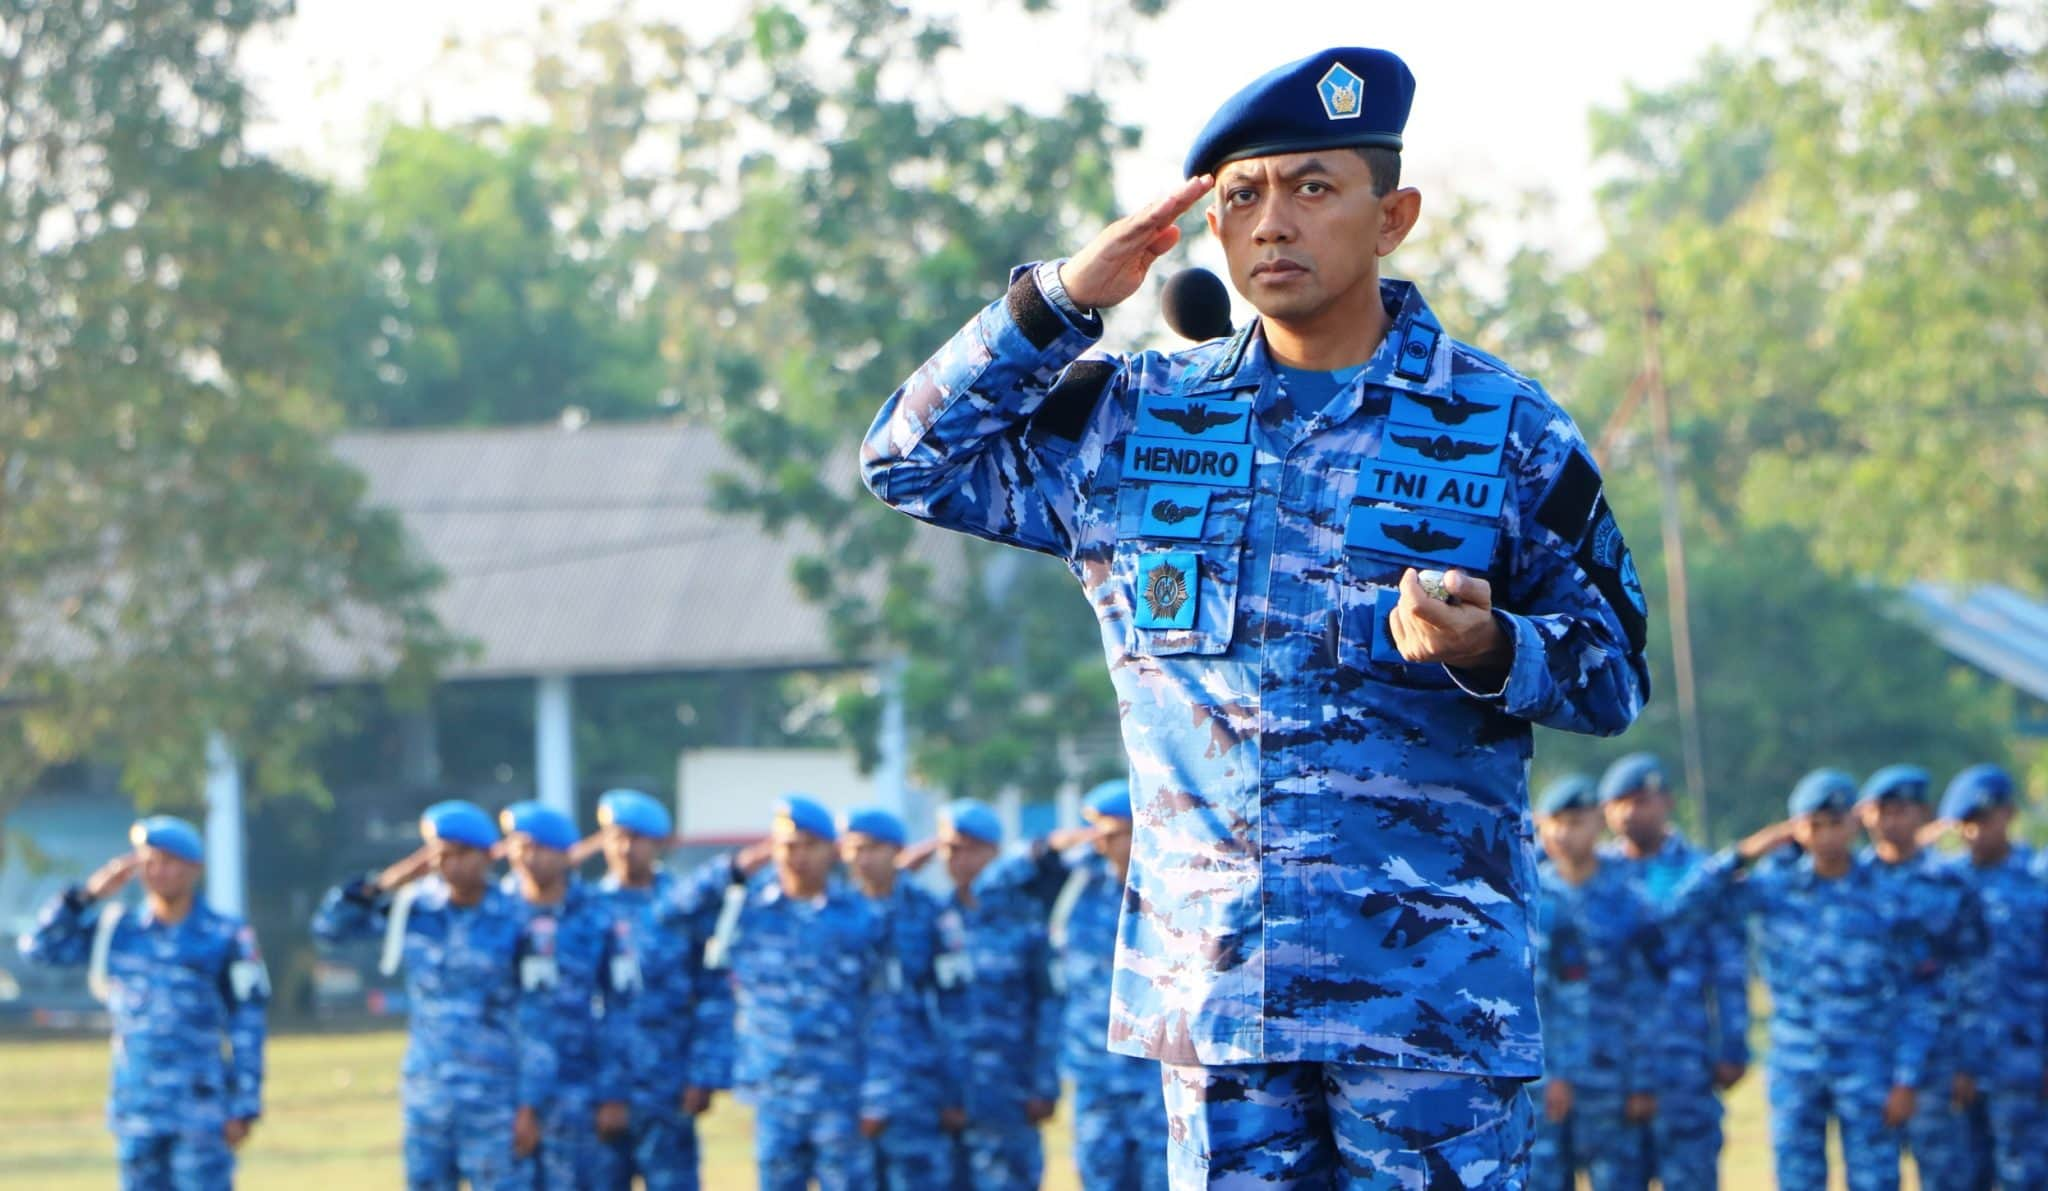 Panglima TNI : TNI Sebagai Pondasi Kehidupan Berbangsa Dan Bernegara